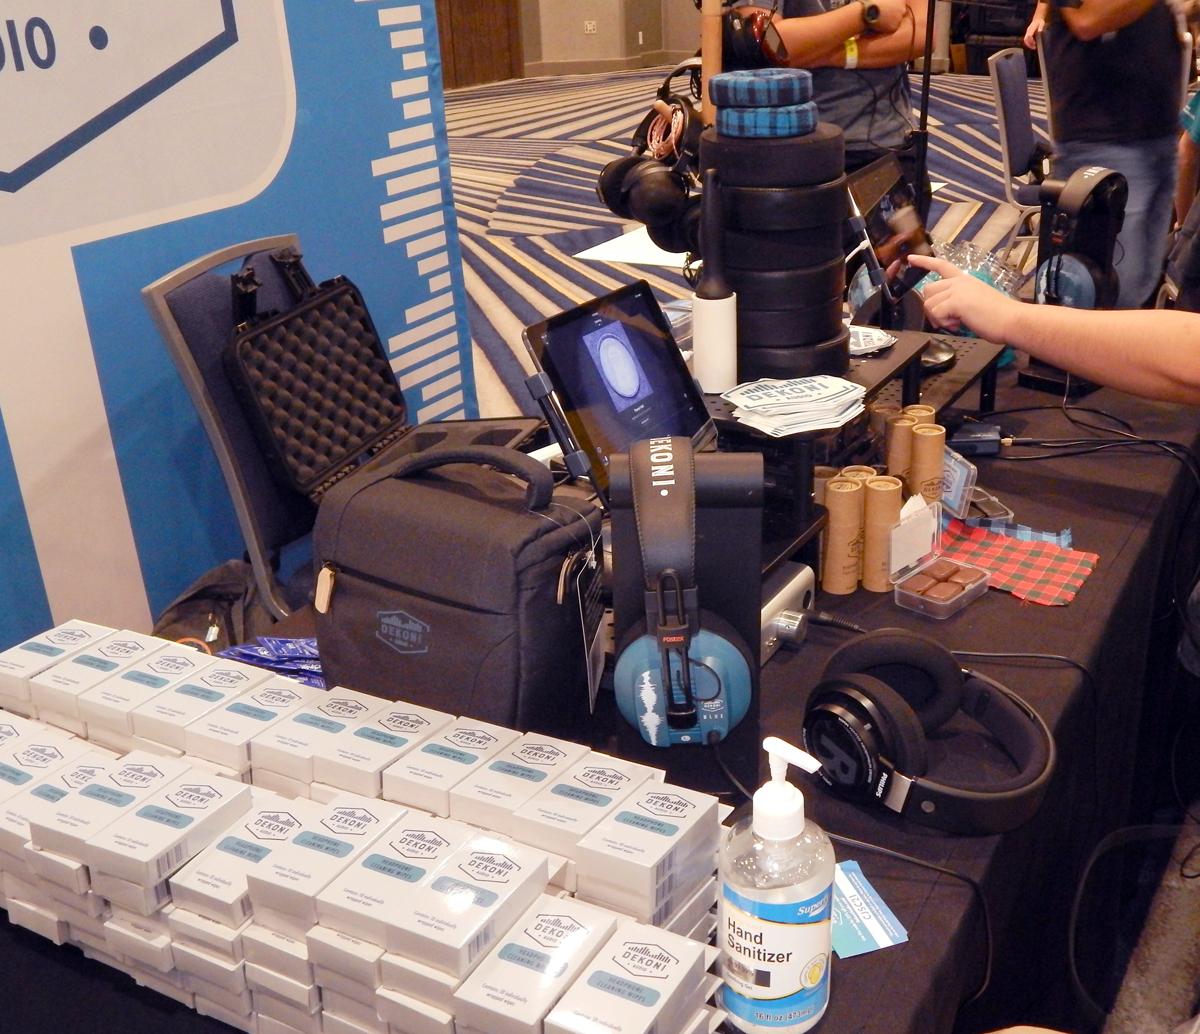 Dekoni headphone wipes, Charcoal Headphone Savior V2 Universal Headphone Carrying Case, Blue Headphones, Headphone Hero (on chair), Headphone Spray, Nuggets Headphone Headband Pressure Relief Pads, and a stack of custom ear-pads CanJam SoCal 2021